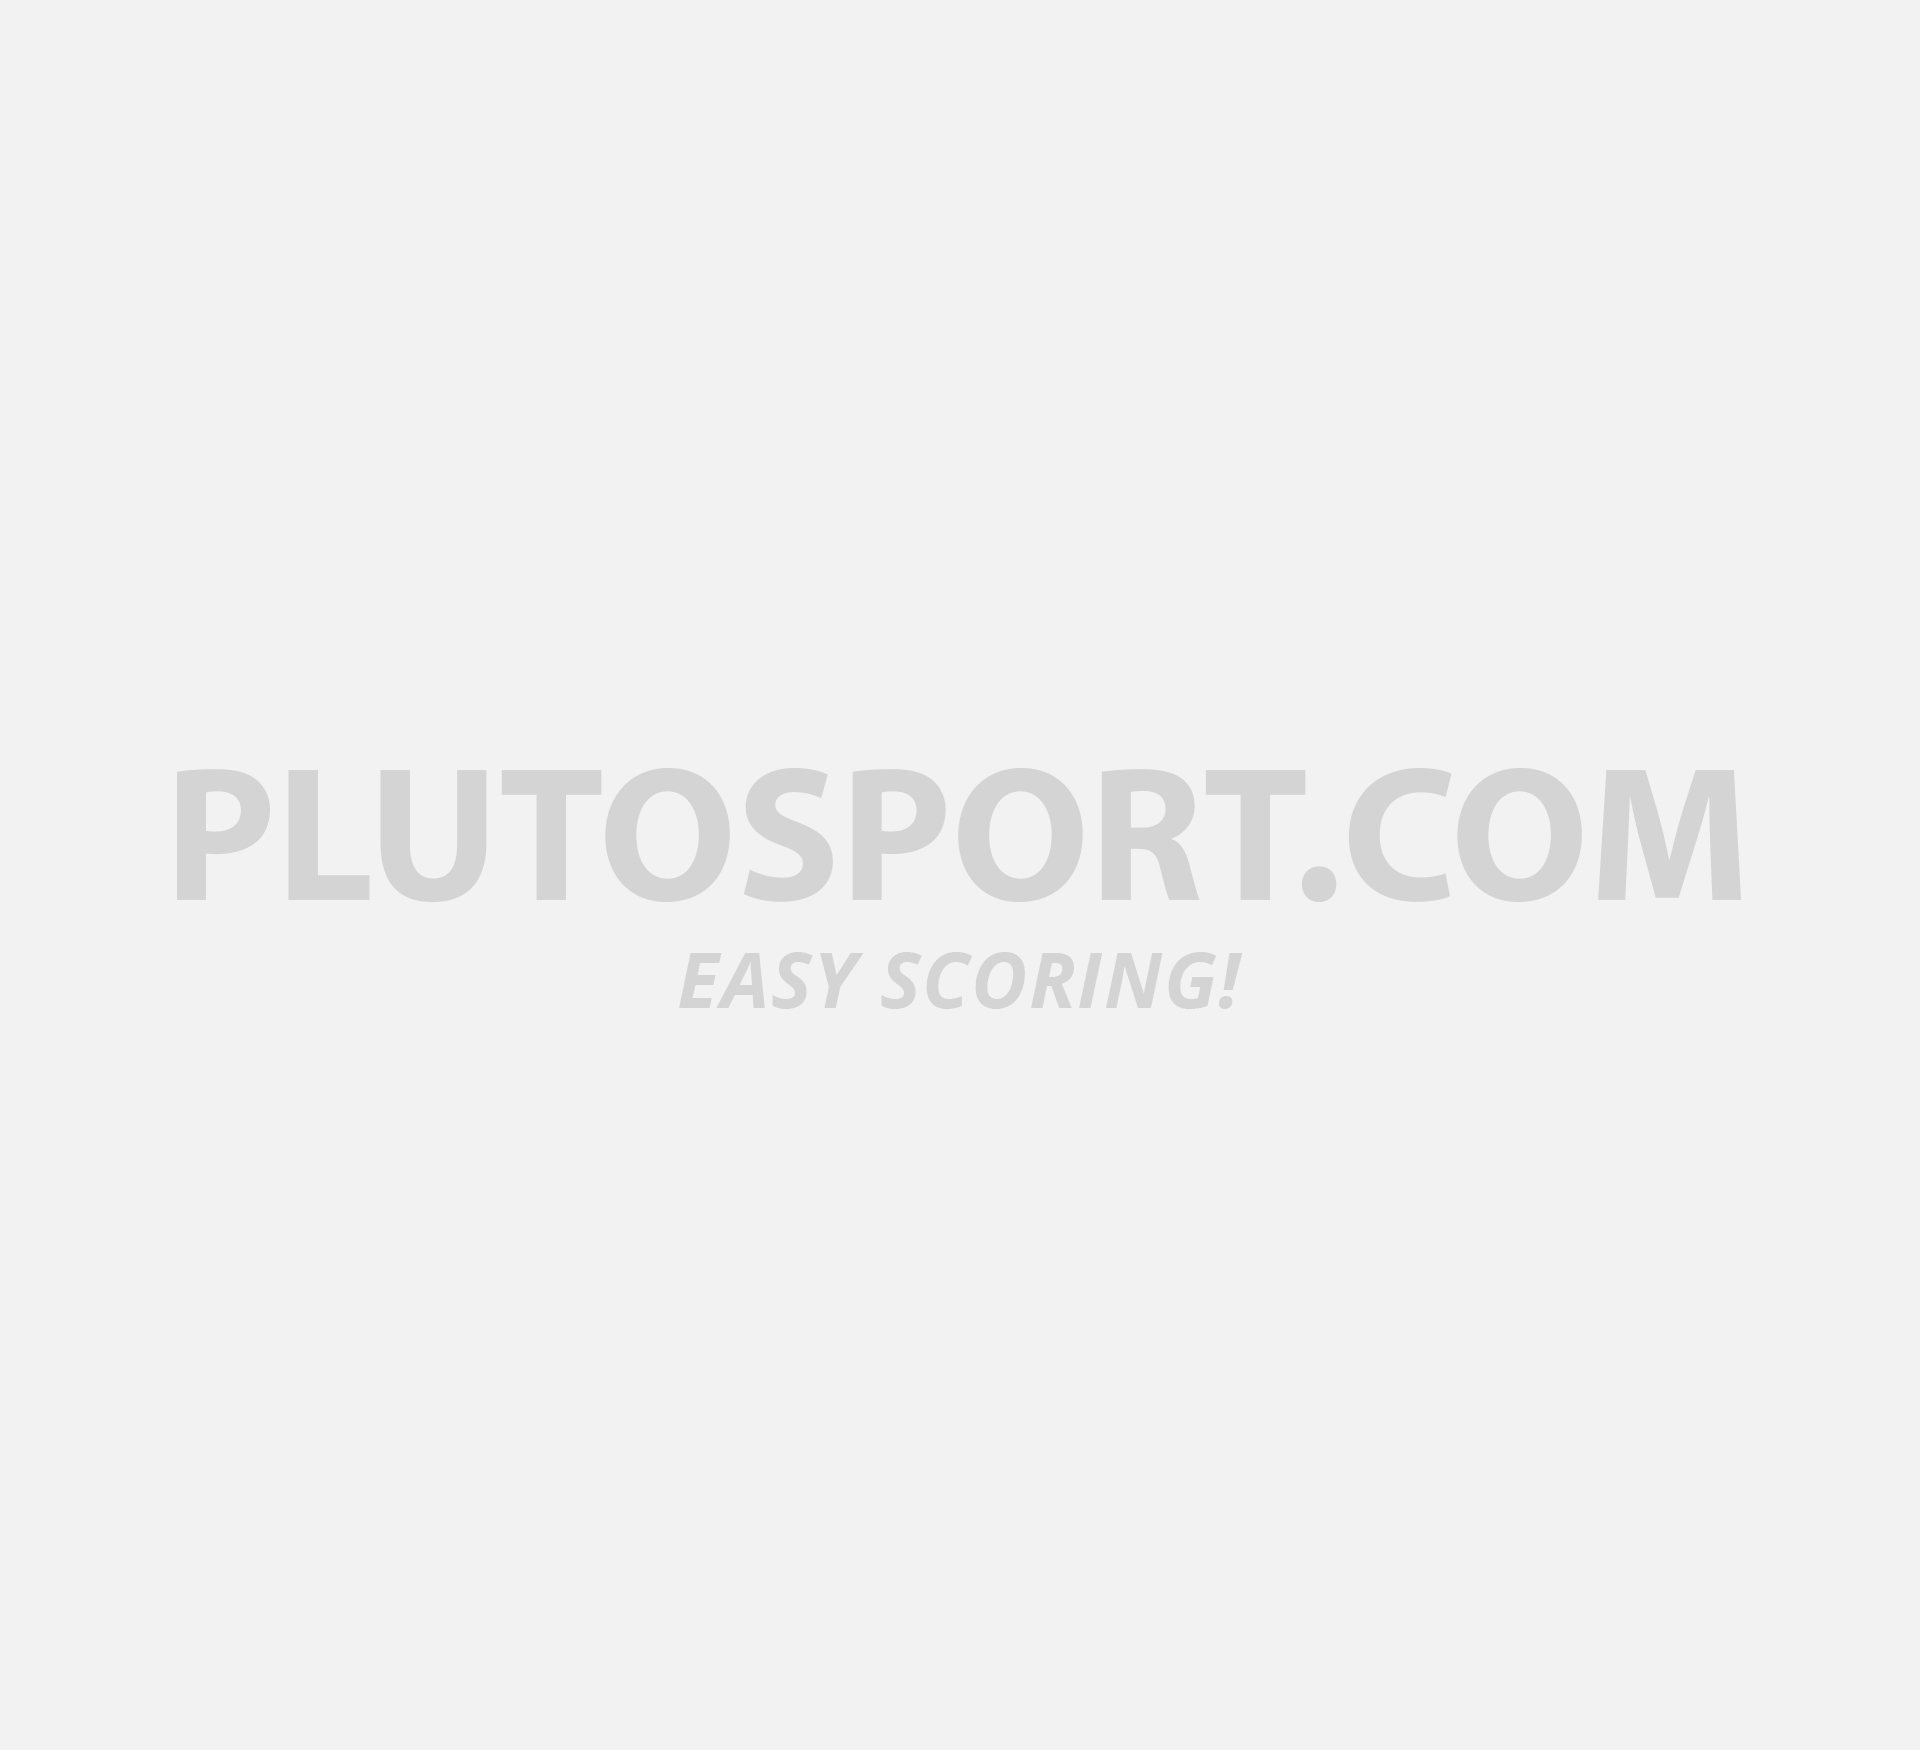 b91aa83982a3 Mizuno Wave Rider 17 Runningshoes Men - Neutral - Shoes - Running - Sports  | Plutosport